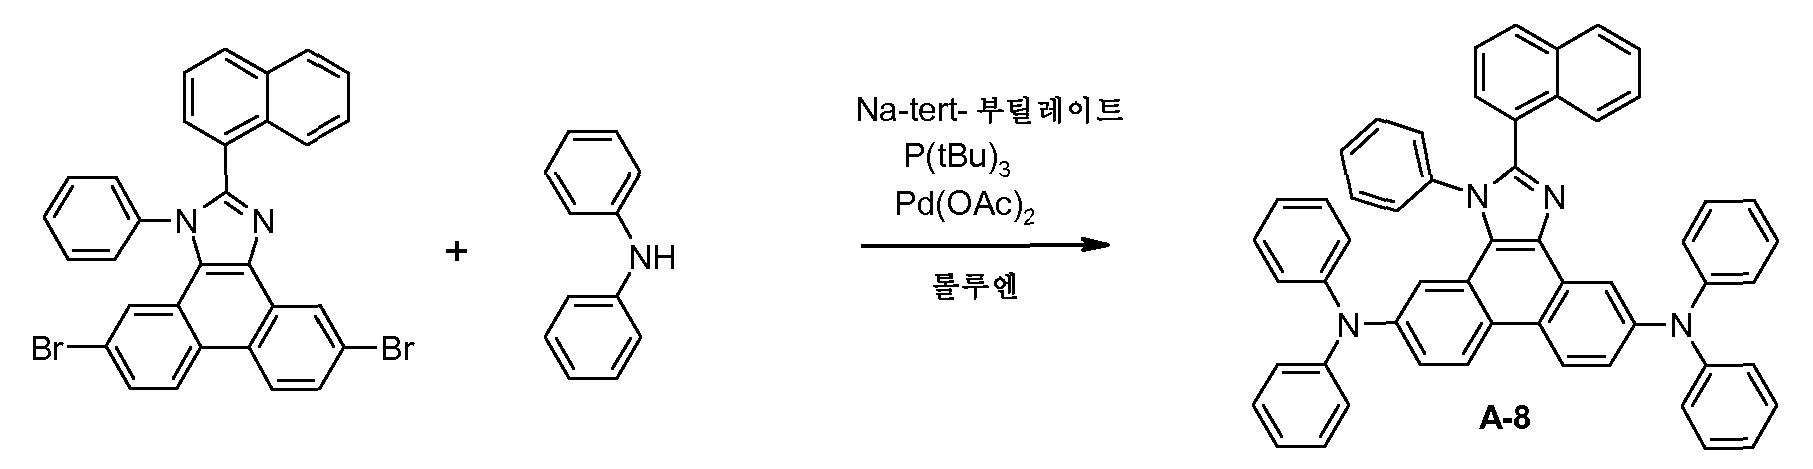 Figure 112012004234516-pct00058